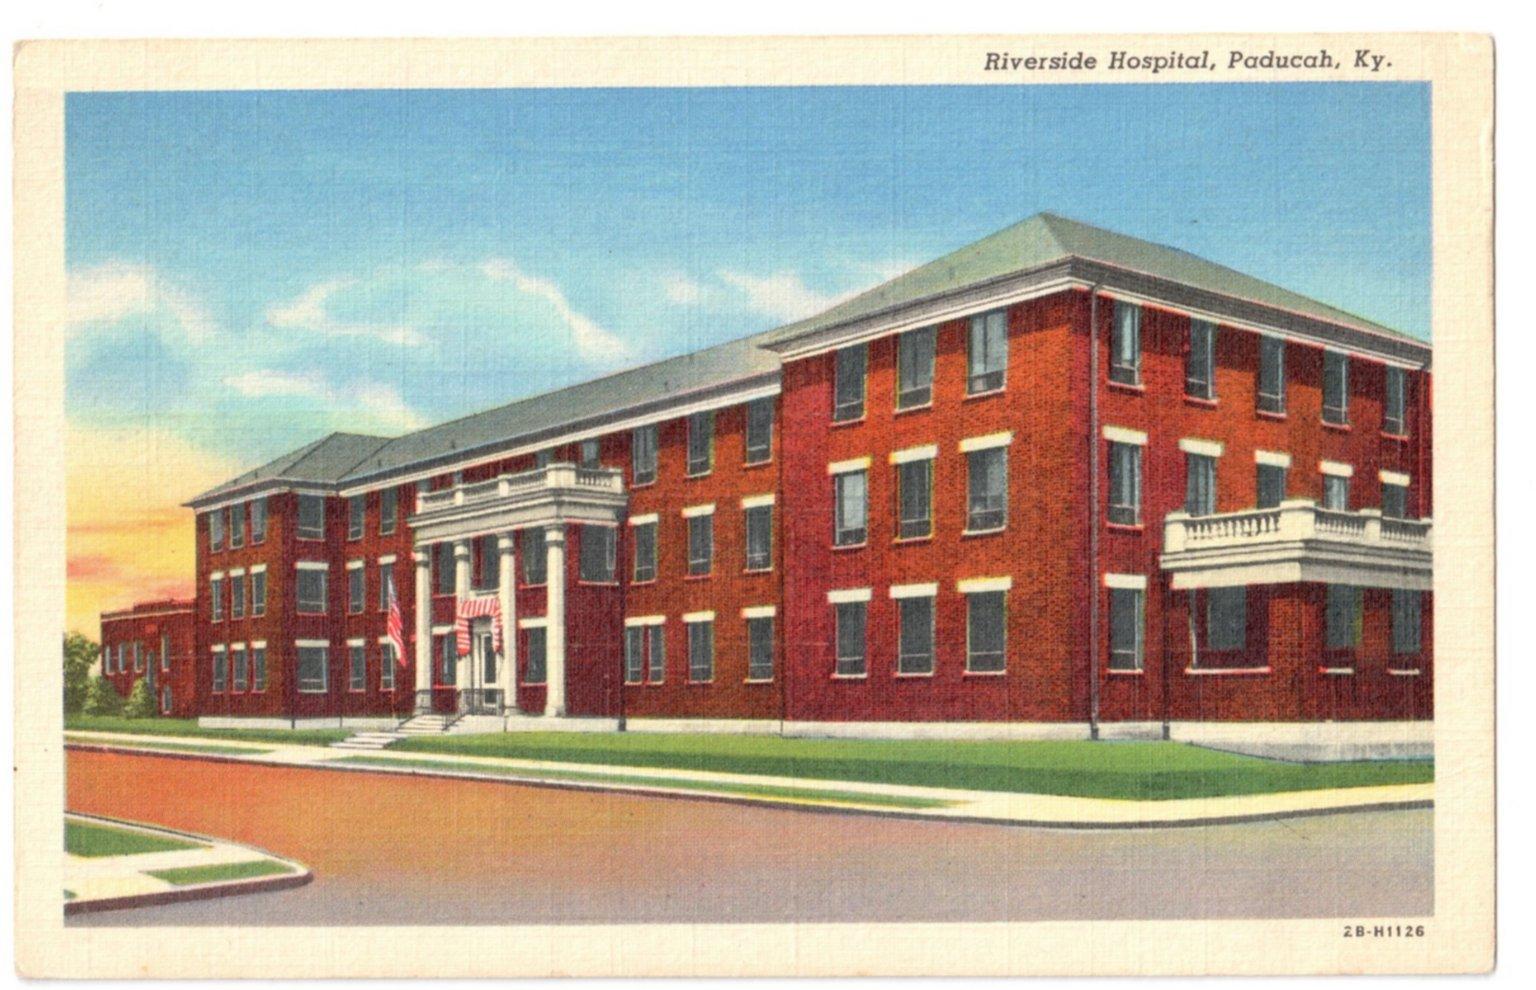 Riverside Hospital, Paducah, KY